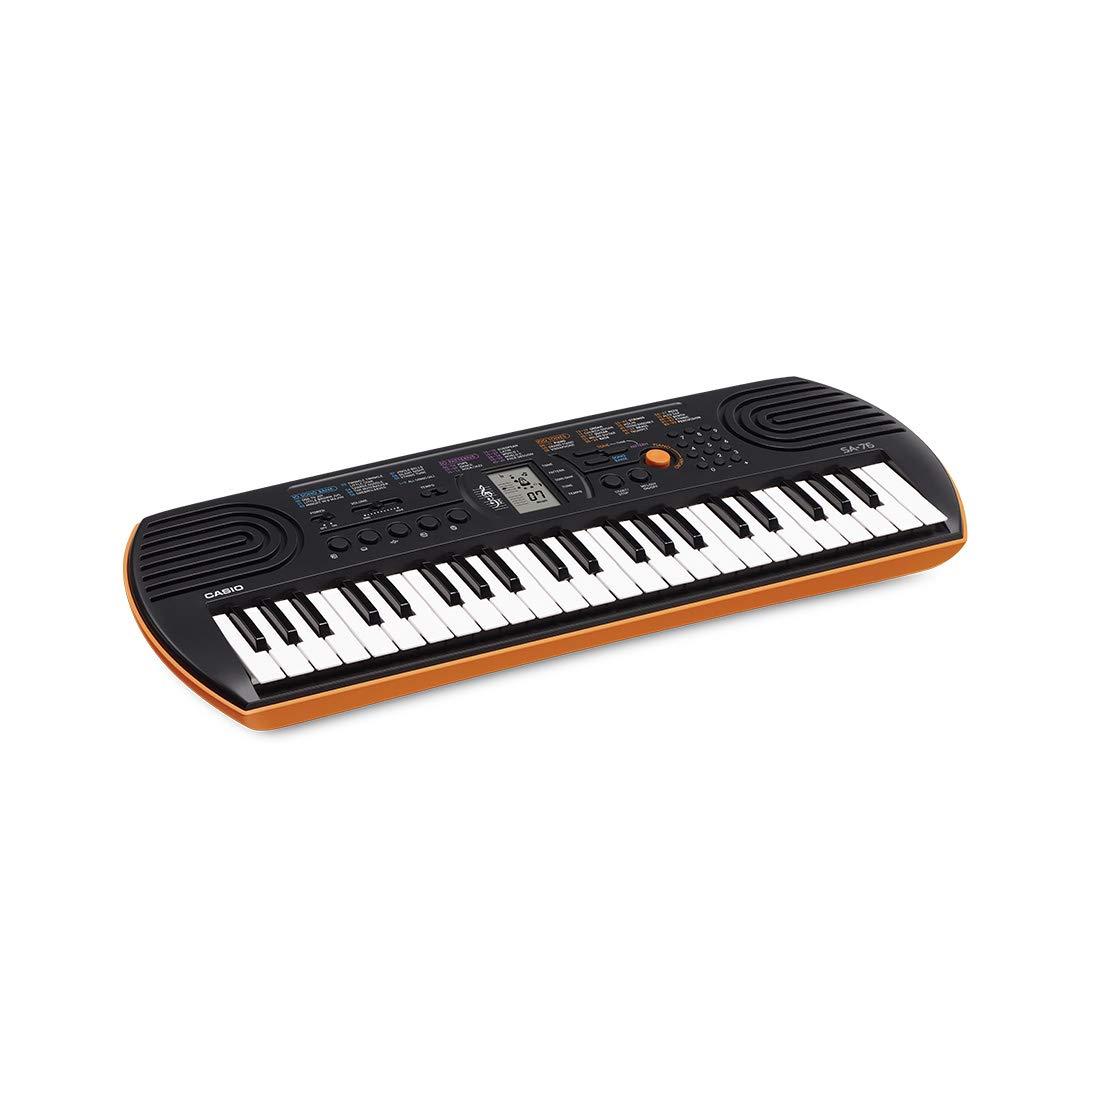 Casio SA g-76h2 Keyboard, 44 teclas